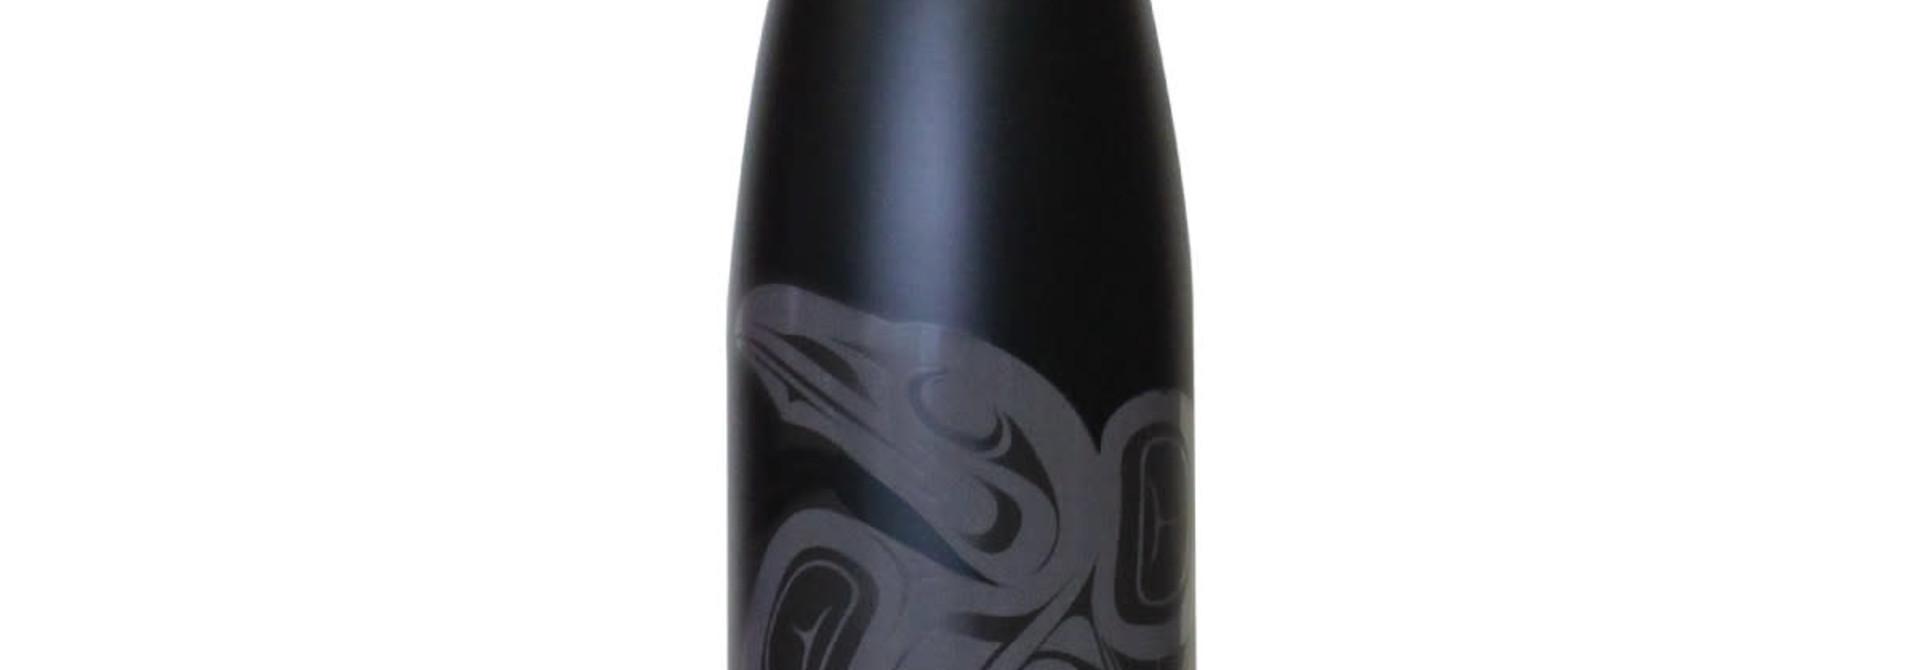 Insulated 17oz. bottle-Raven by Francis Horne Sr.